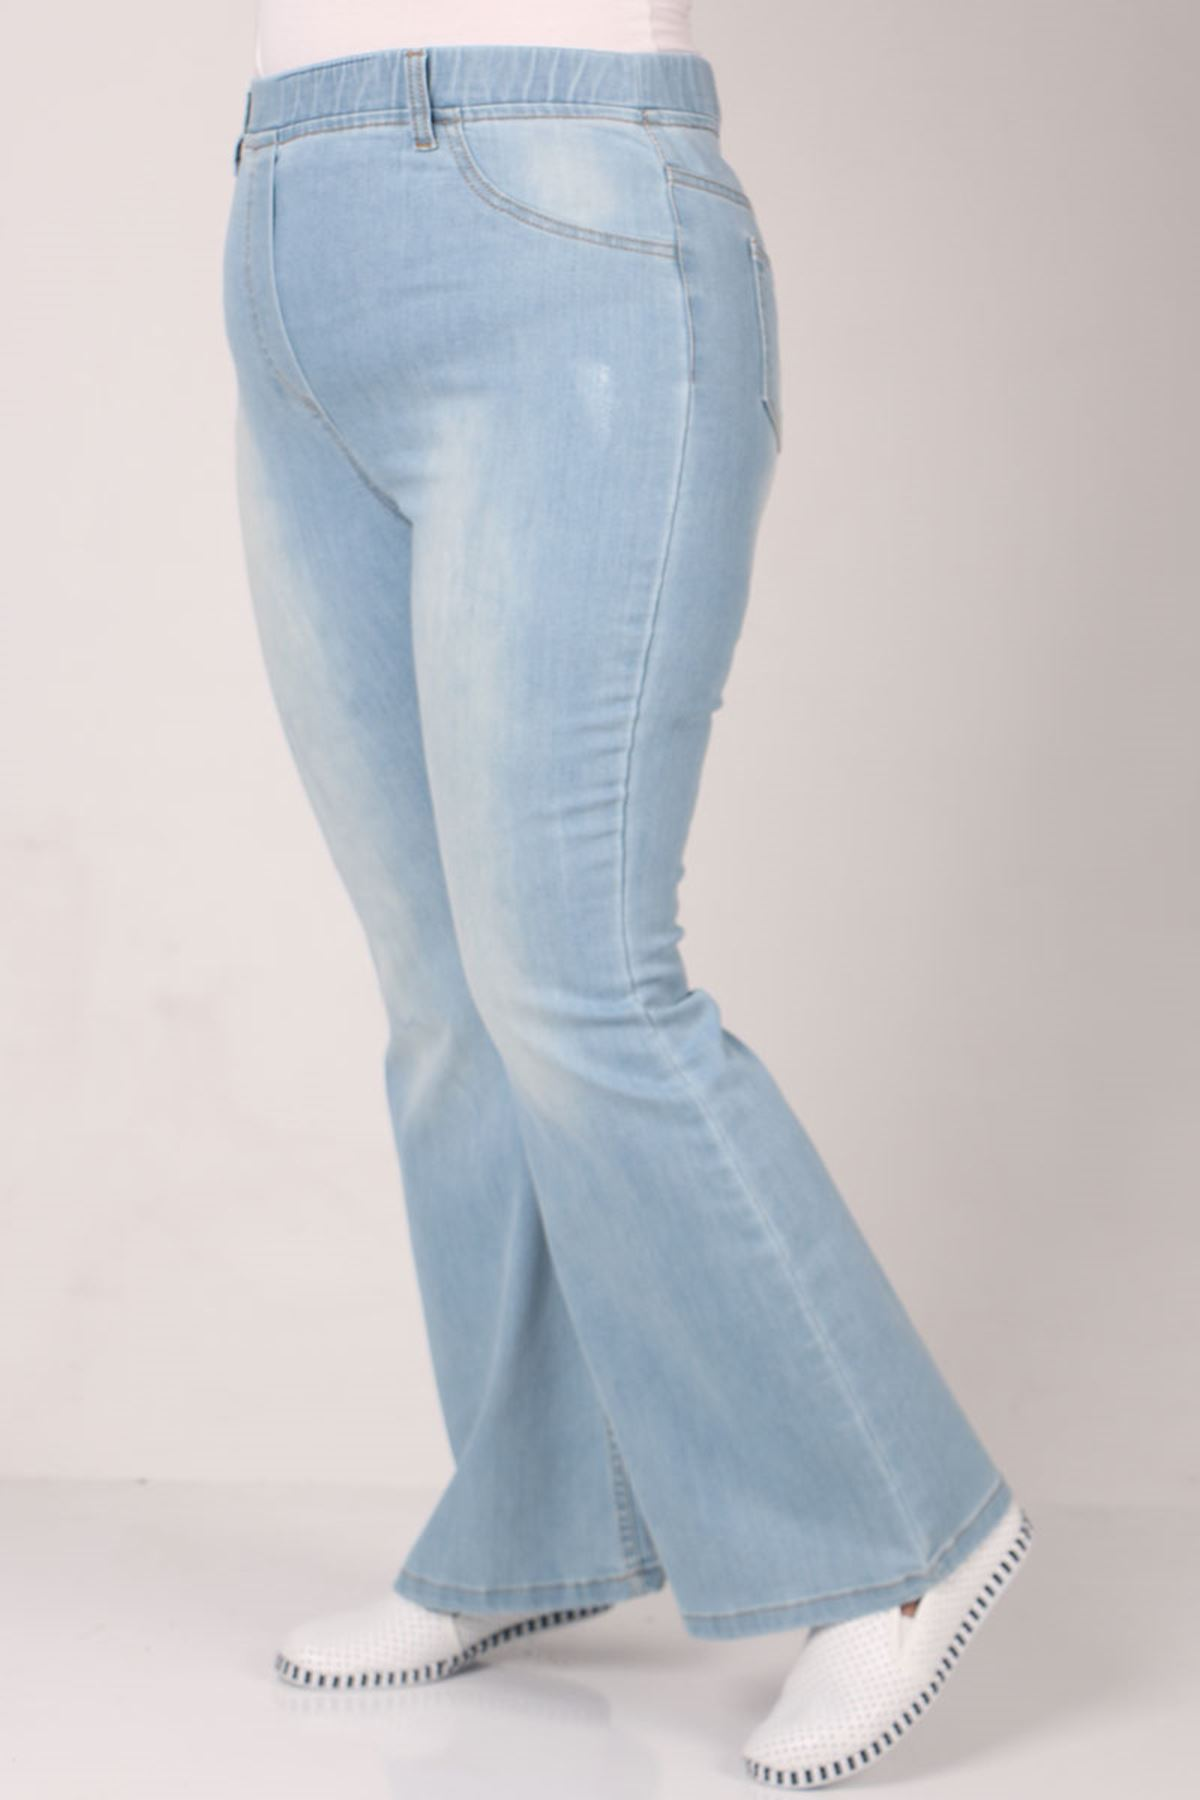 9137 Plus Size Elastic Waist Flared Jeans - Dark Navy Blue